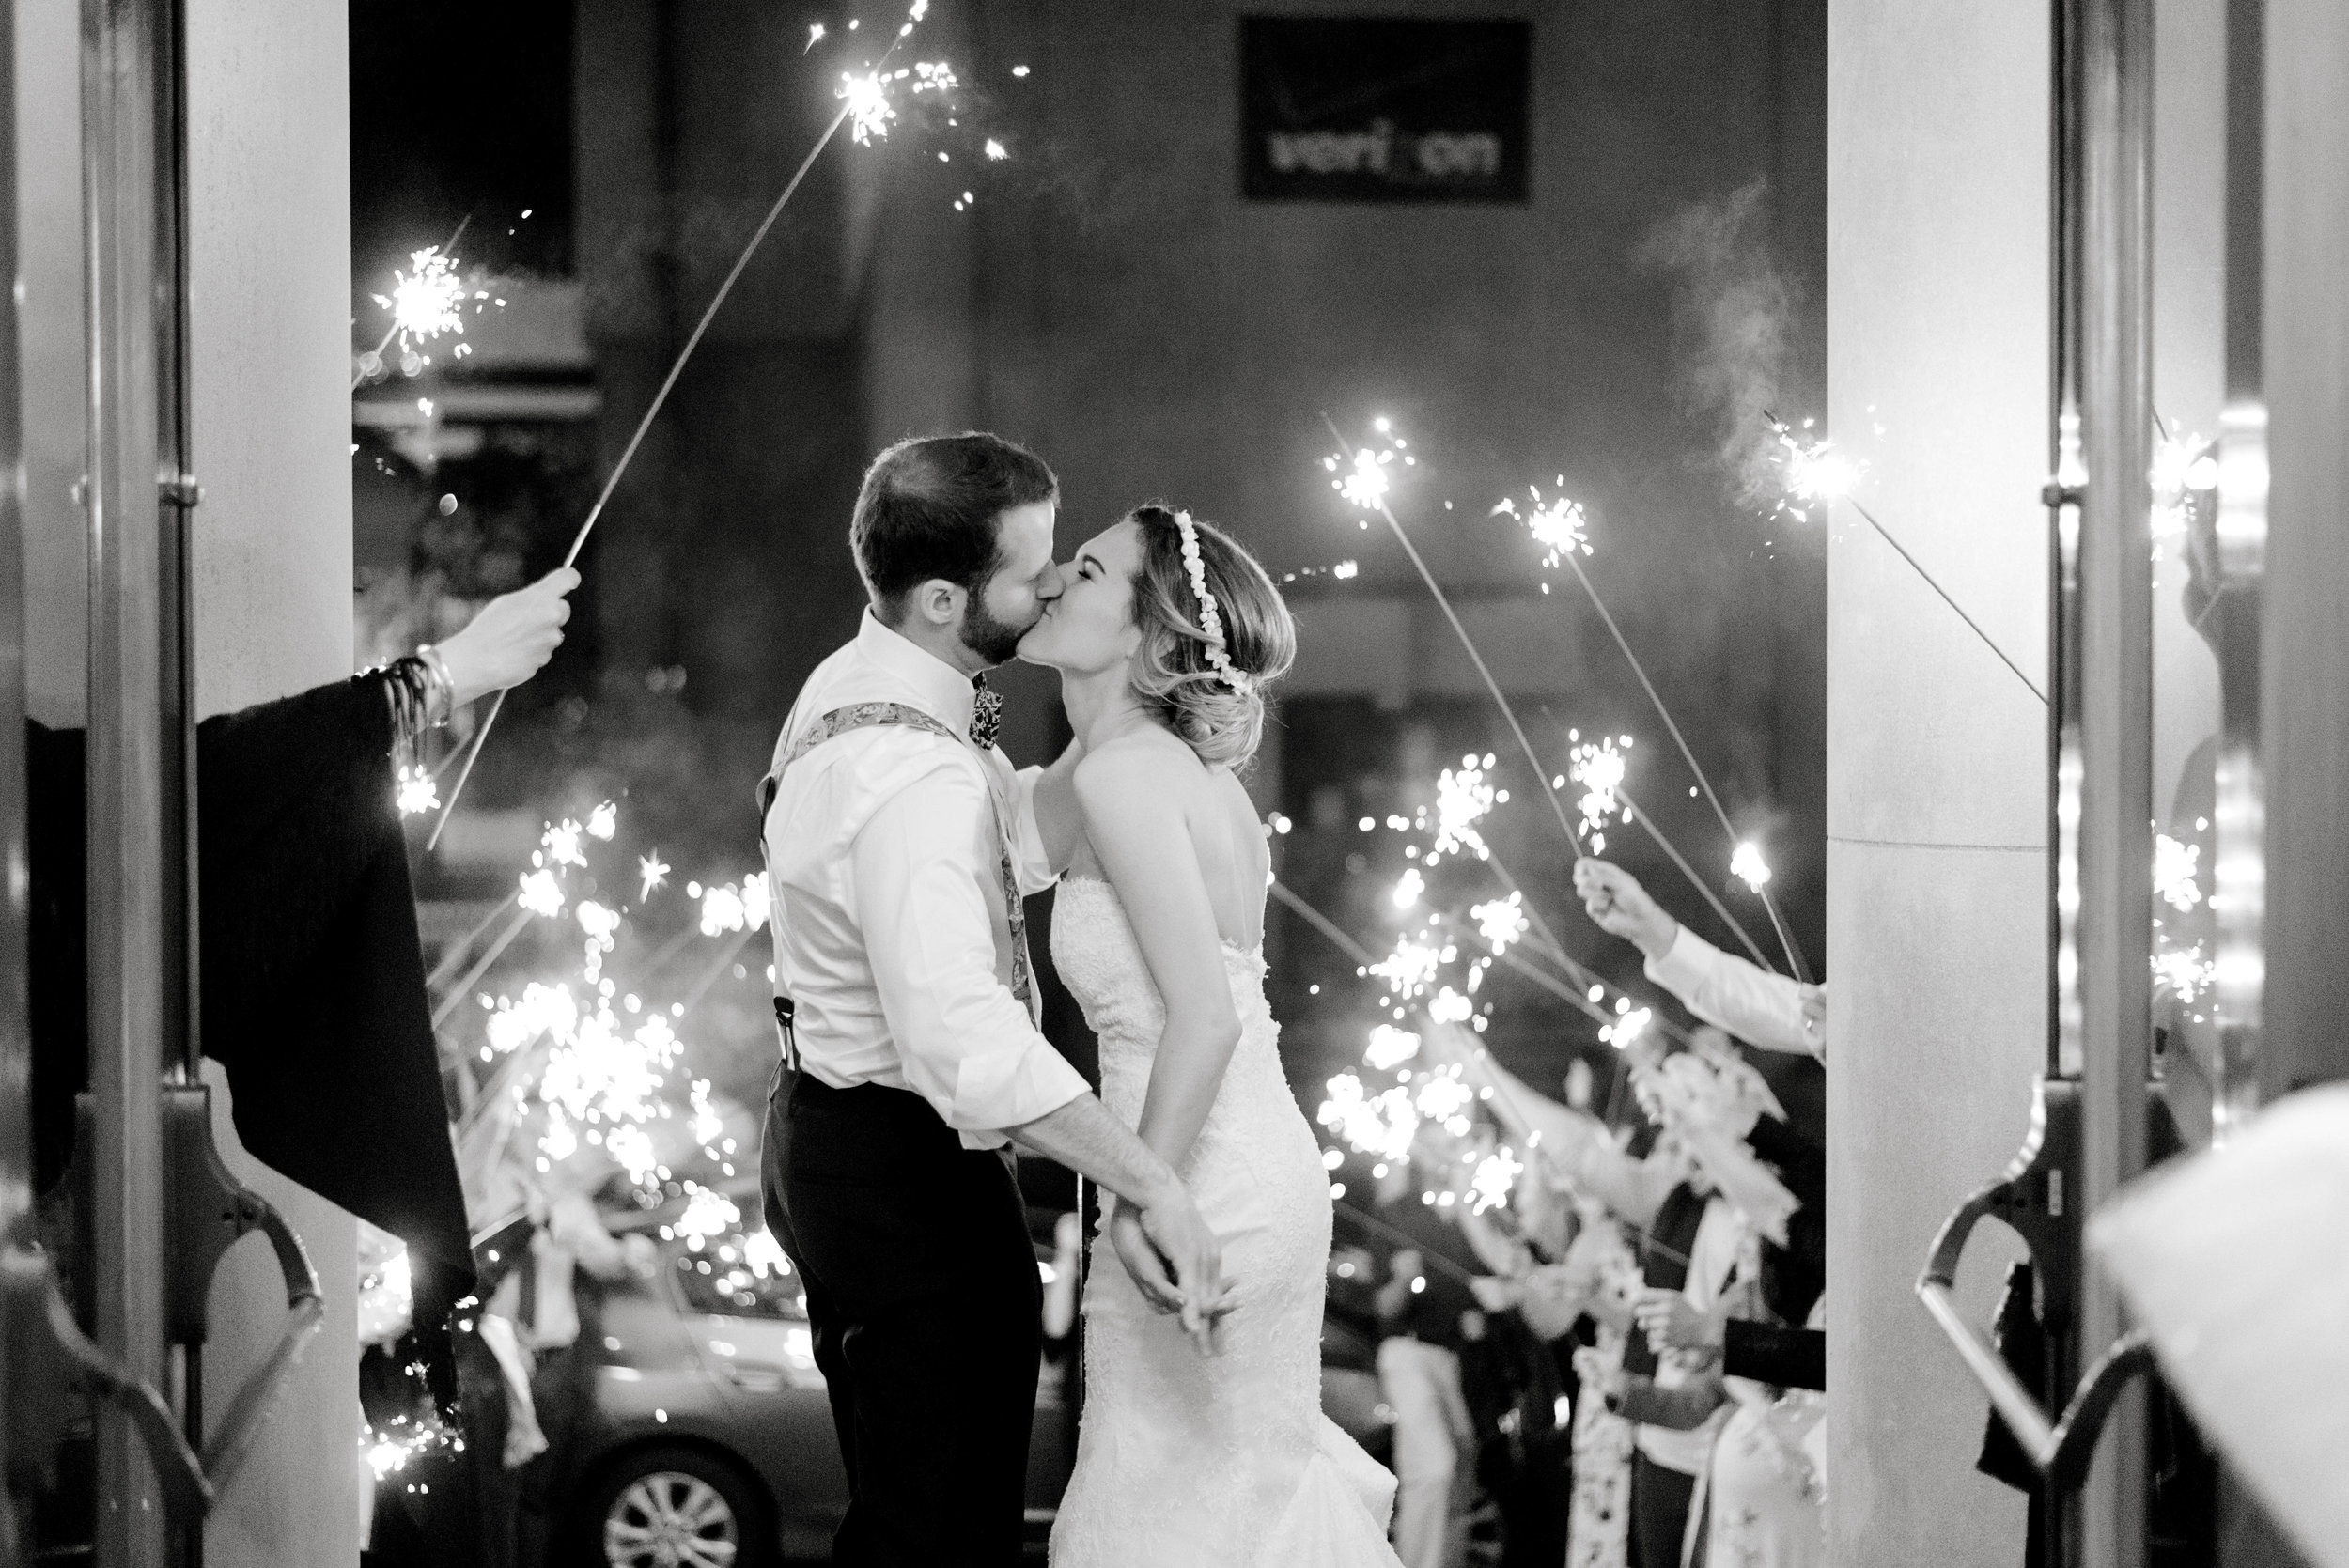 gray-door-photography-wedding-portraits-dallas-photographer-steph-erffmeyer3.jpg